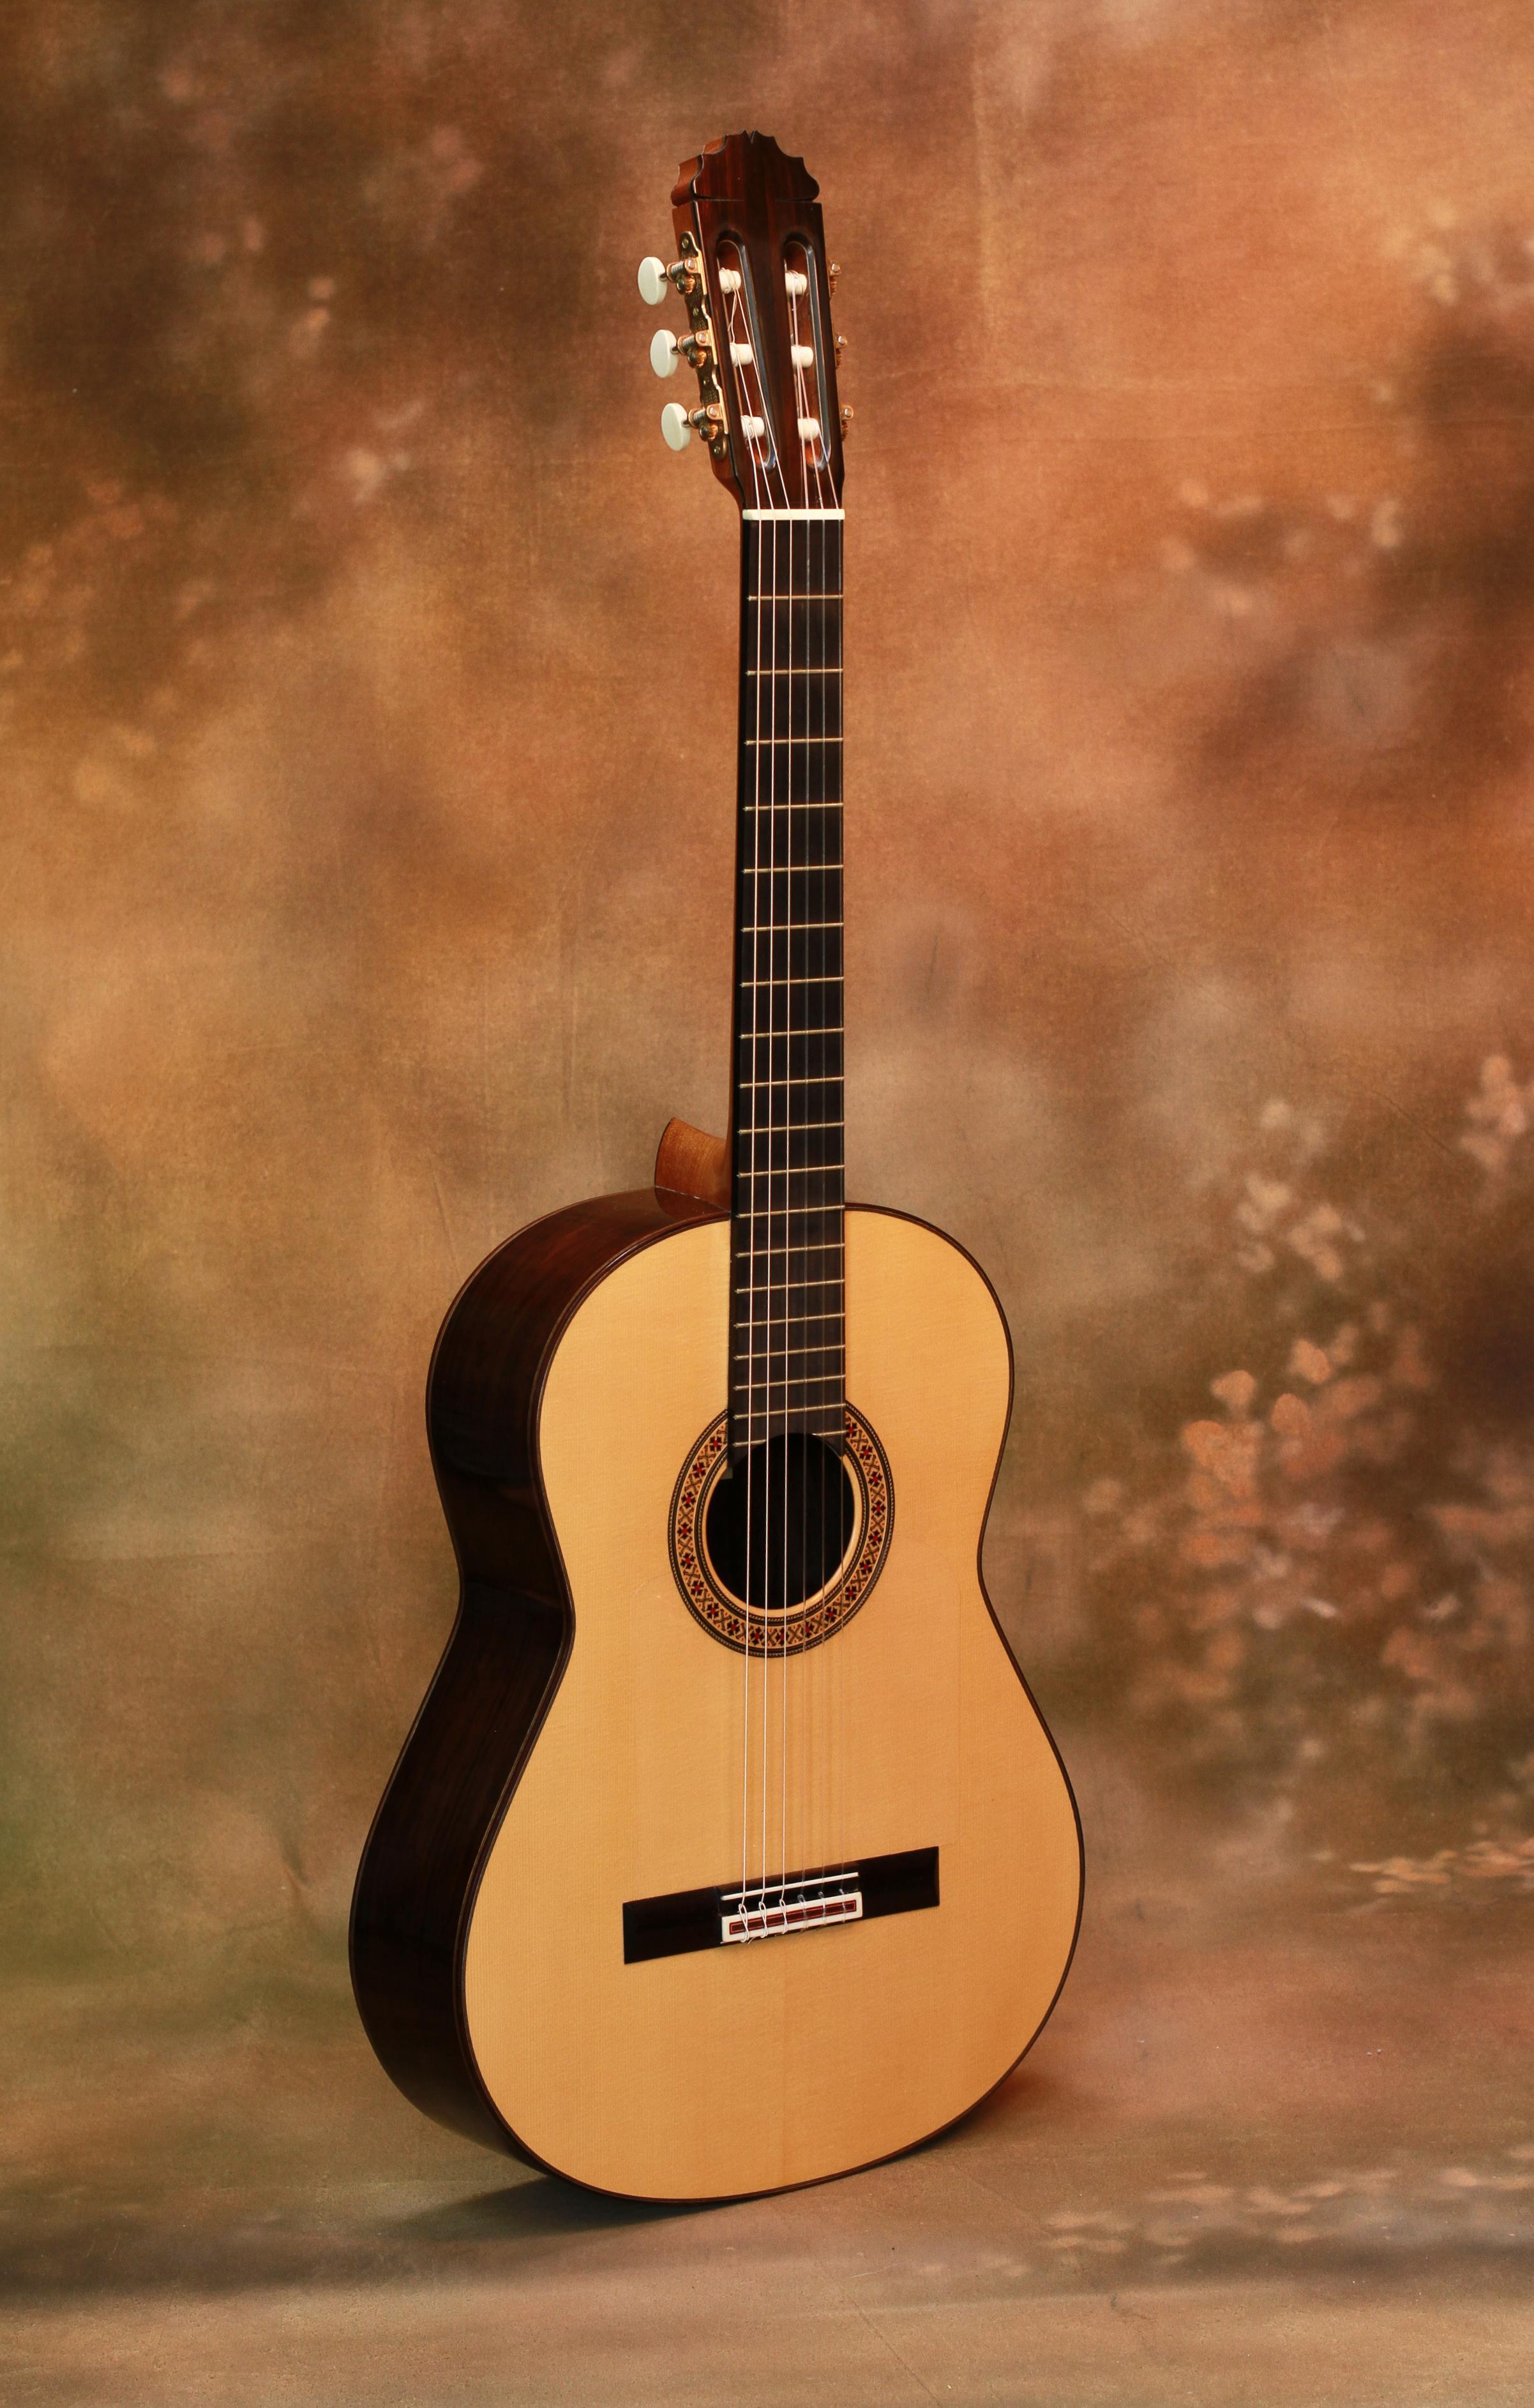 thomas blackshear 318 reyes savage classical guitar. Black Bedroom Furniture Sets. Home Design Ideas